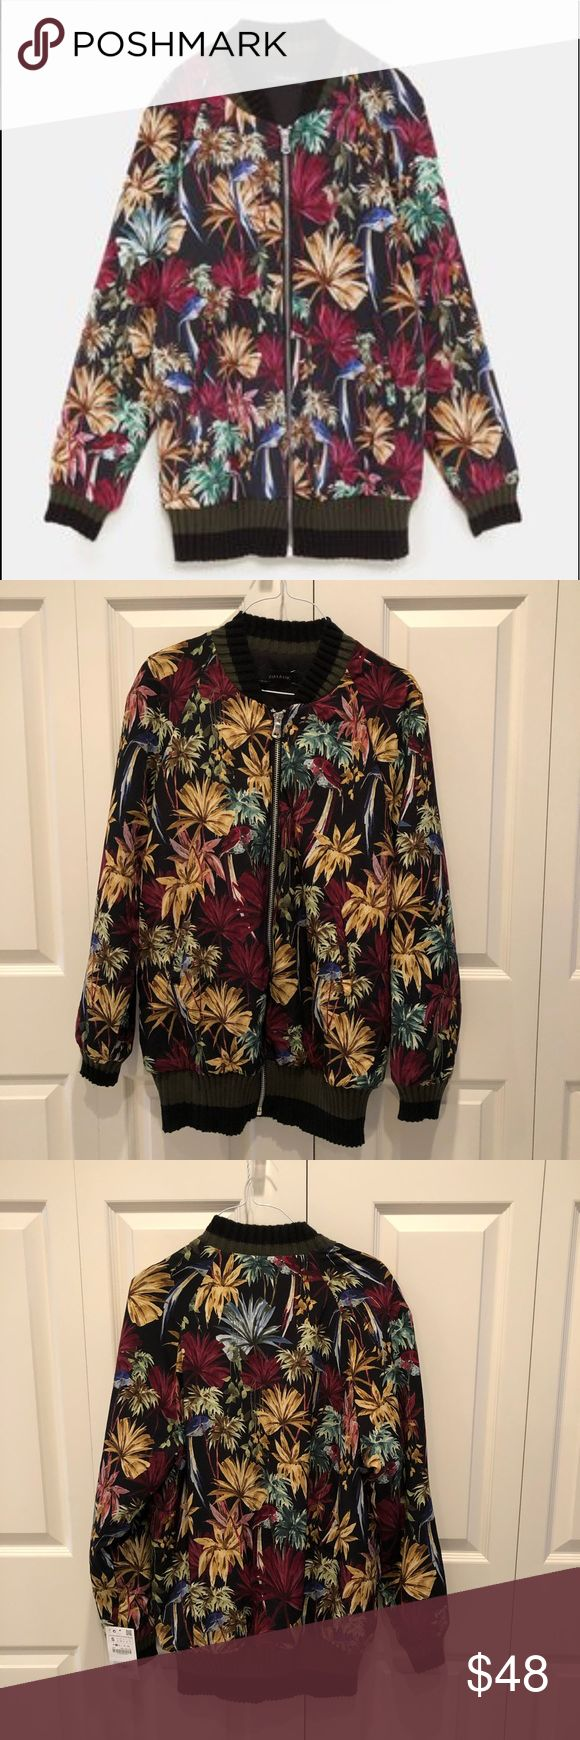 Zara Floral print bomber jacket NWT Floral print bomber